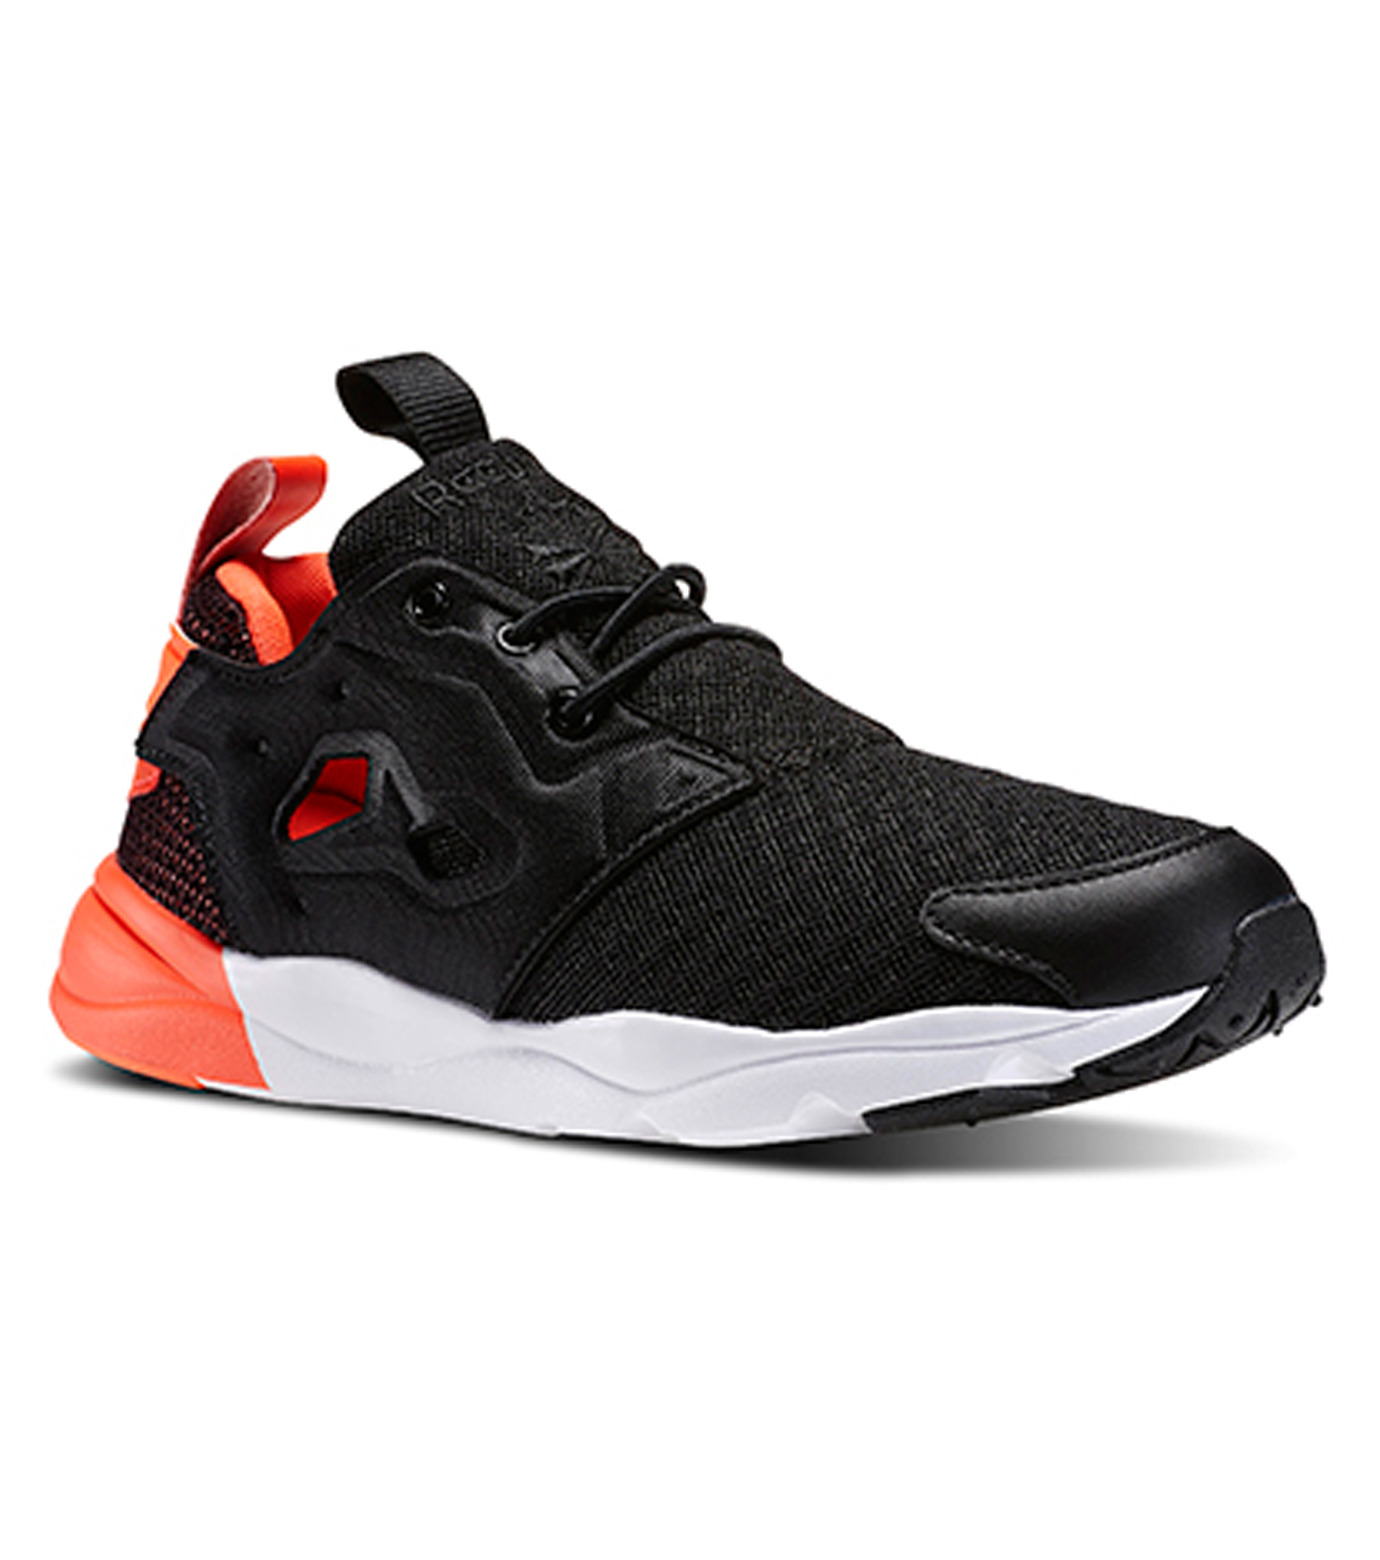 Reebok(リーボック)のFURYLITE POP-BLACK(シューズ/shoes)-V72678-13 拡大詳細画像3